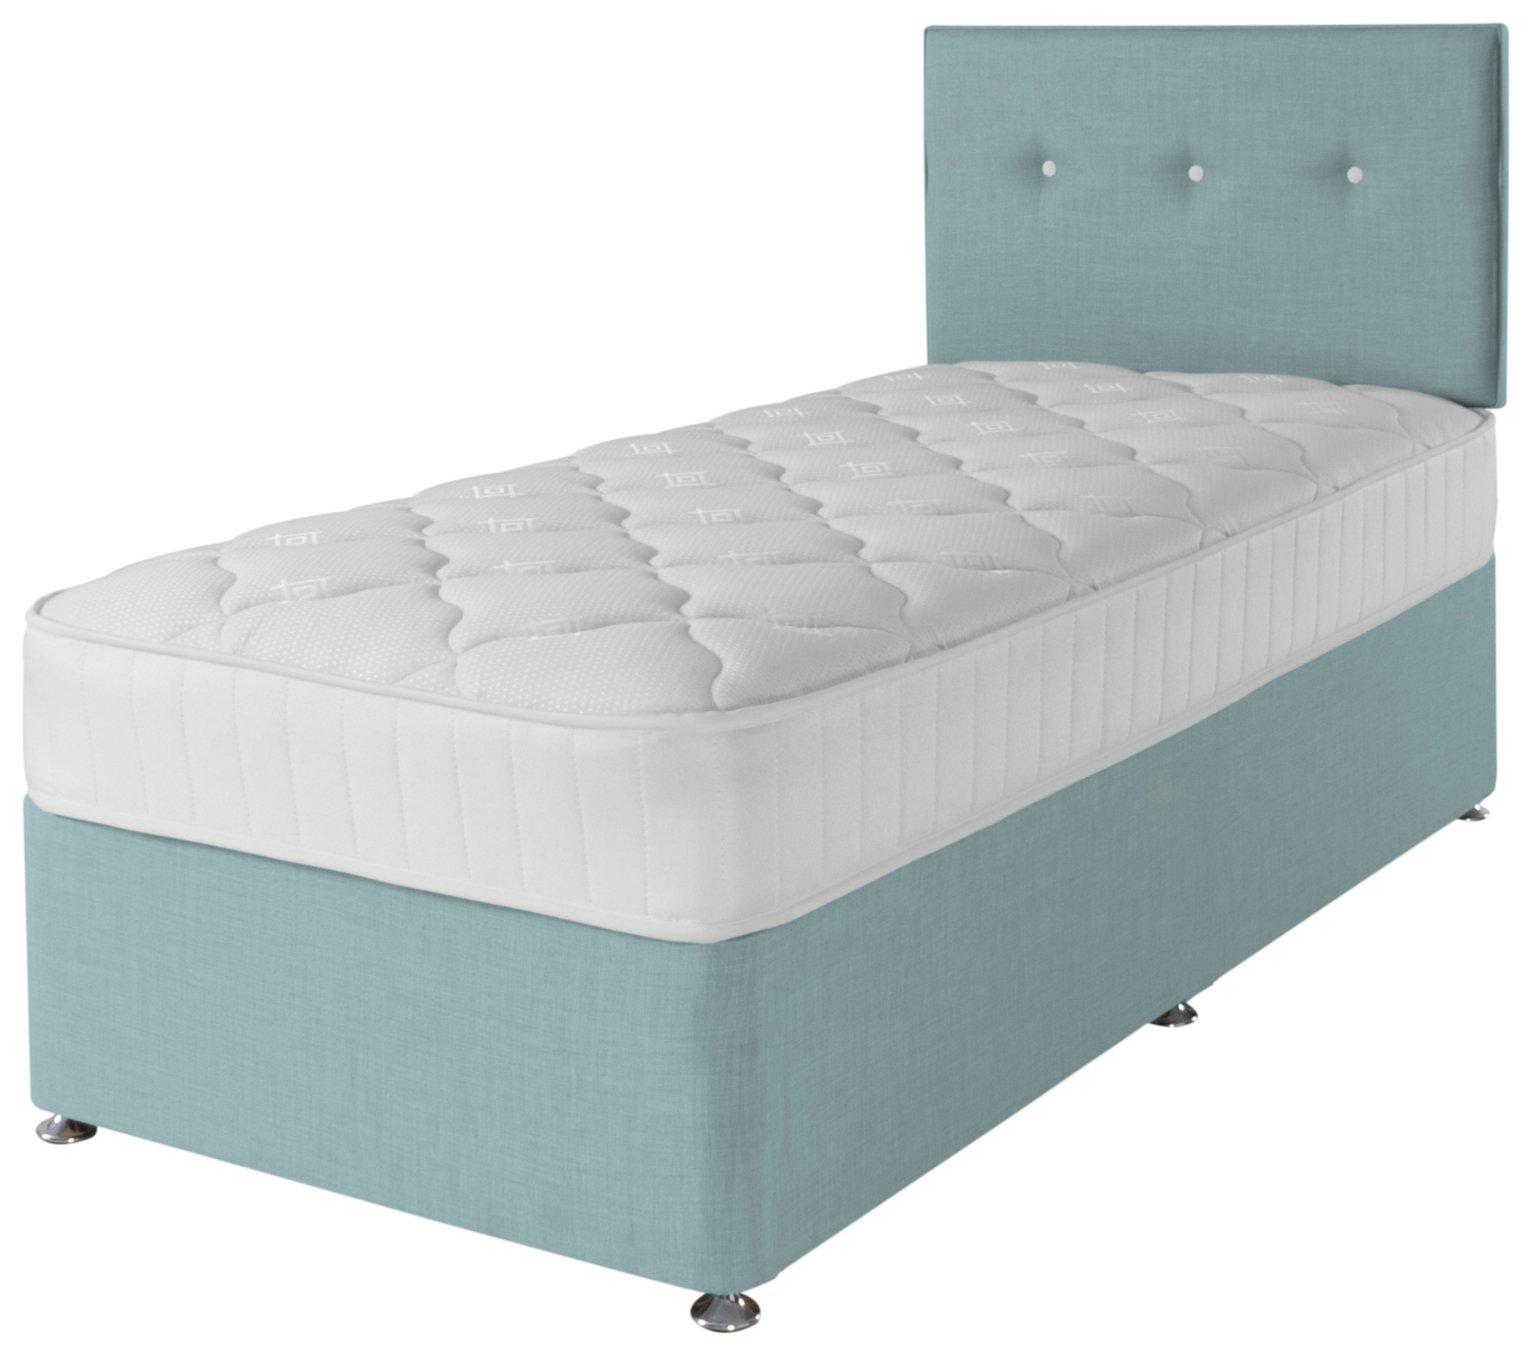 Airsprung Dalham 800 Pocket Memory Blue Divan Bed - Single